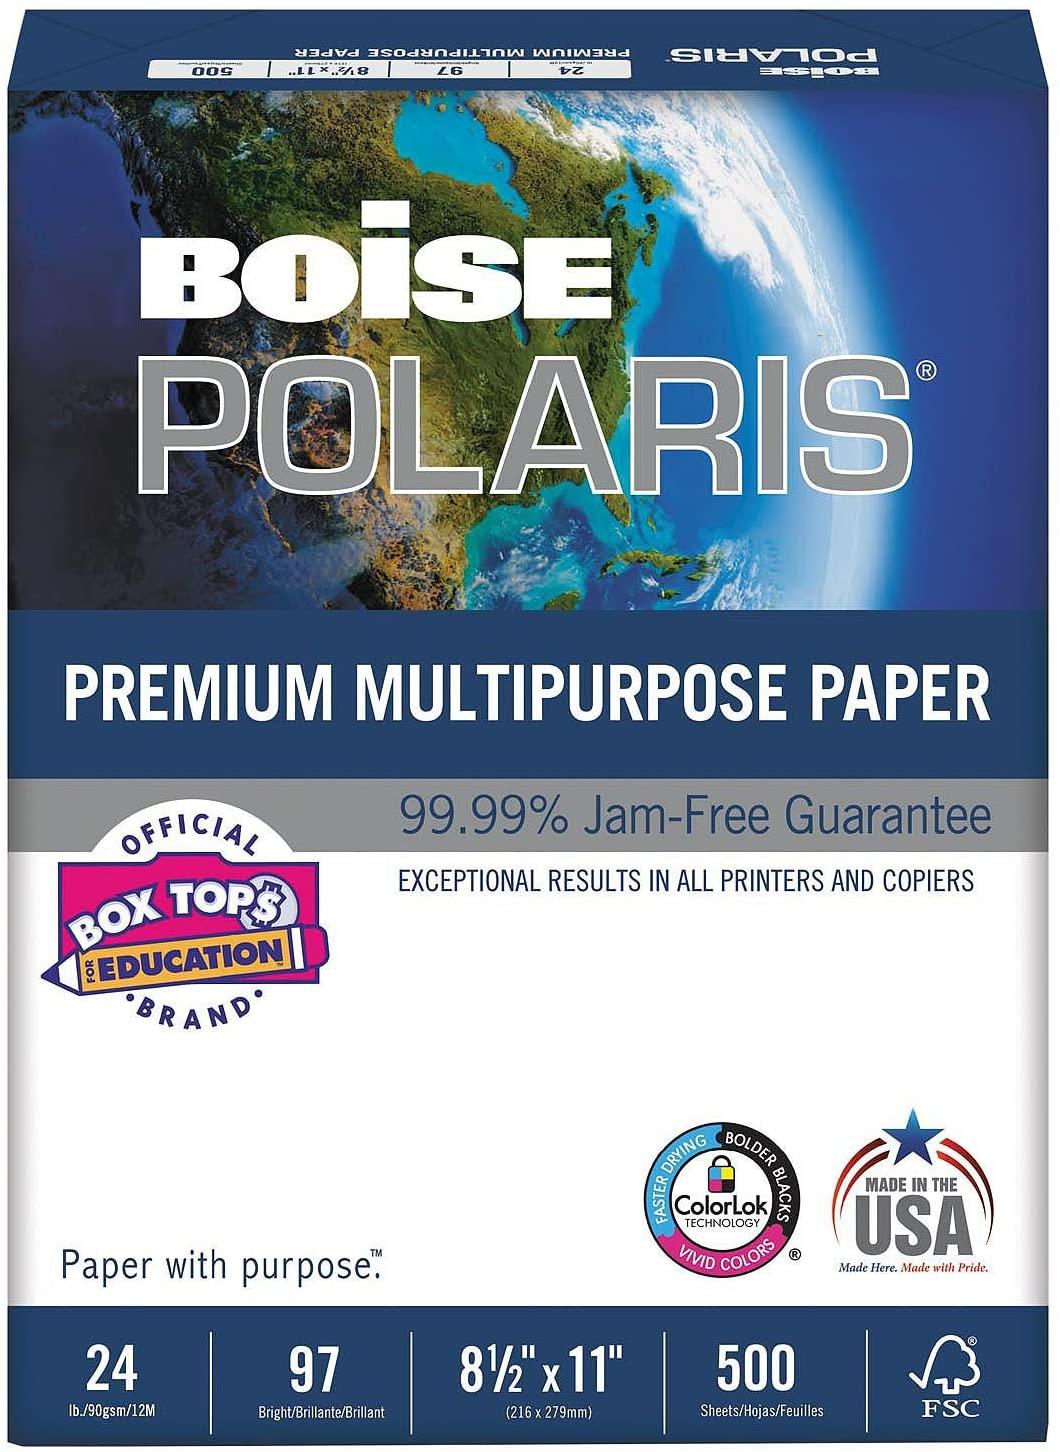 Boise - POLARIS Copy Paper, 8 1/2 x 11, White - 5,000 Sheets/Carton ES